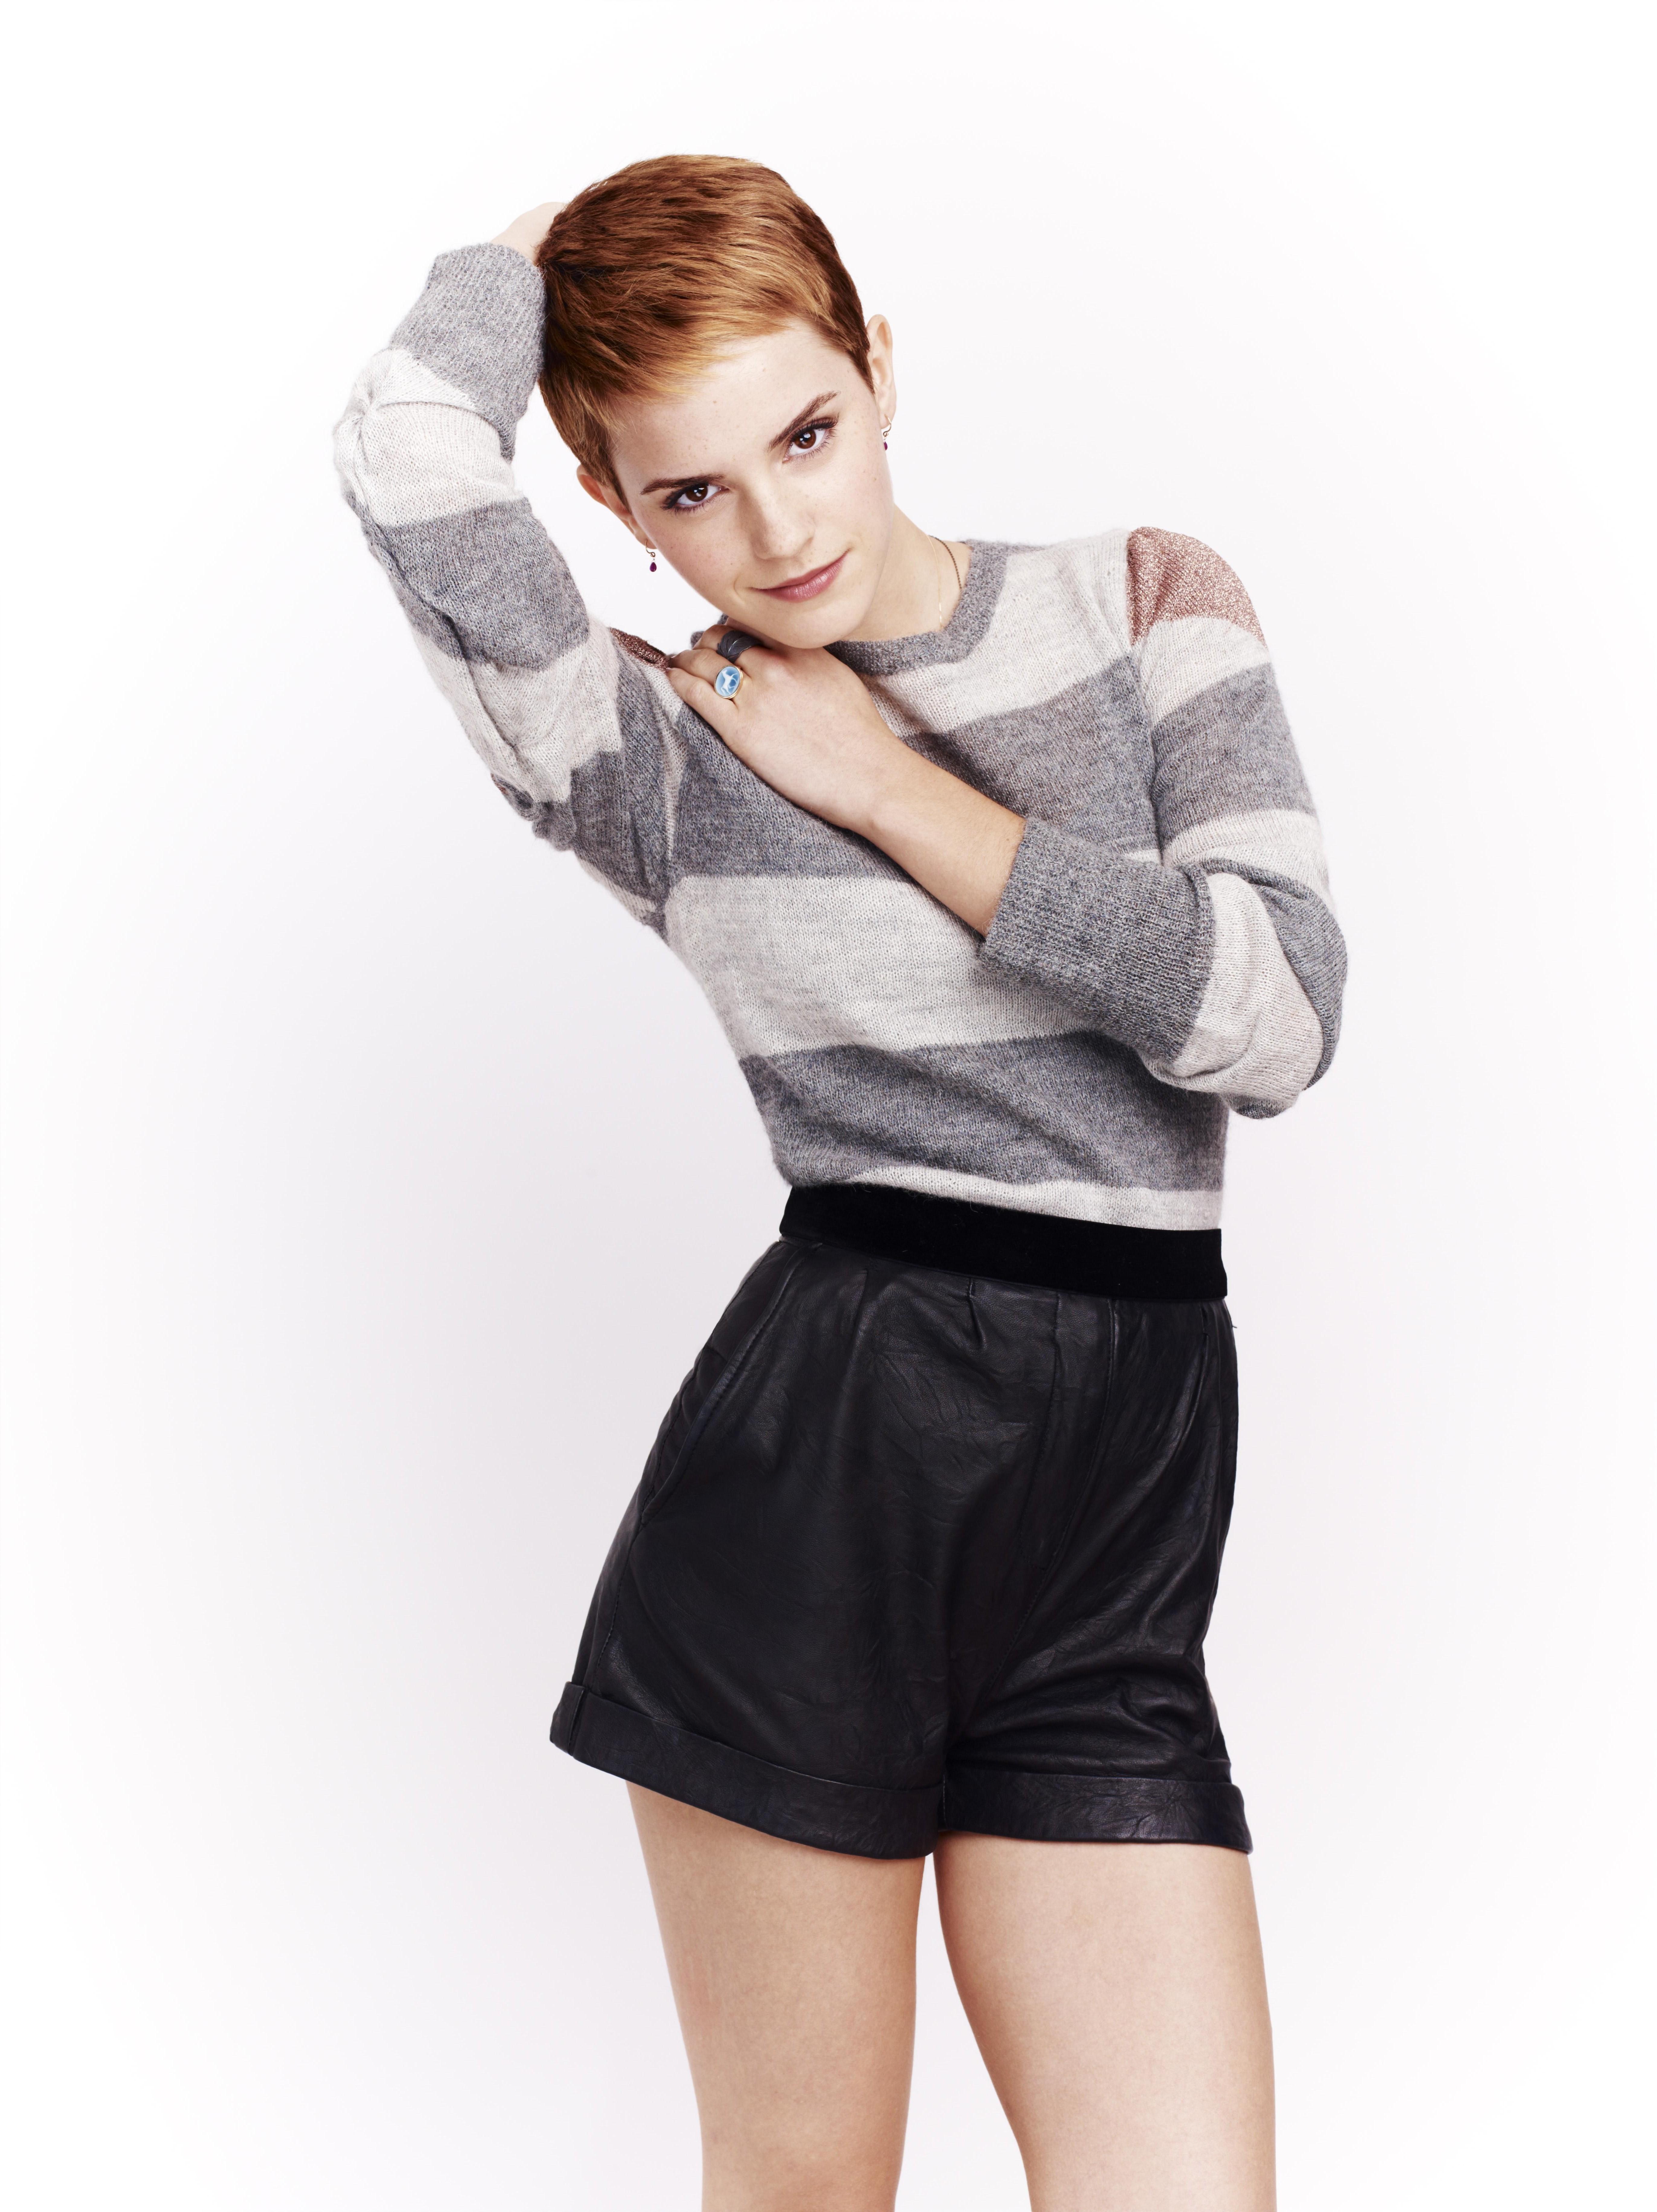 Arya Stark, Hot Pie, Needle , Maisie Williams Wallpaper - Maisie Williams Uhd Hot , HD Wallpaper & Backgrounds